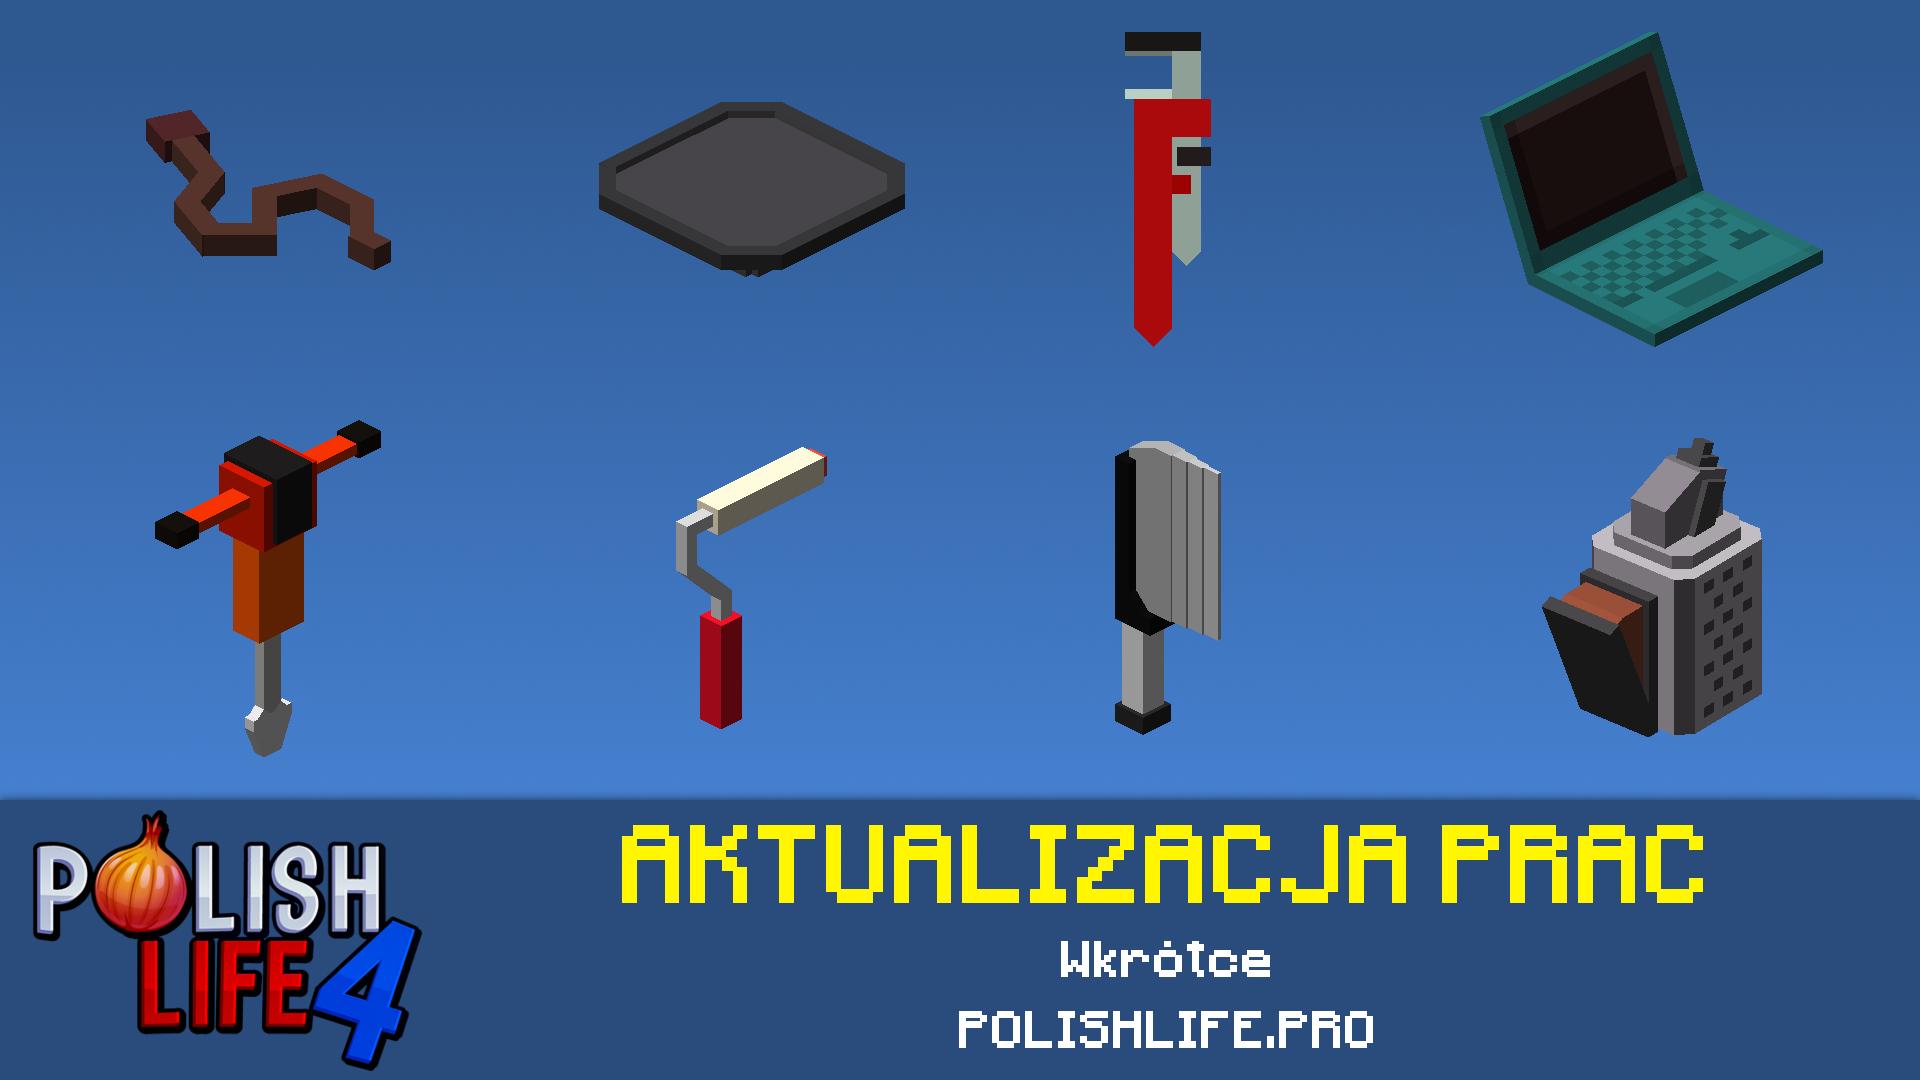 polishlife-aktualizacja-prac.png